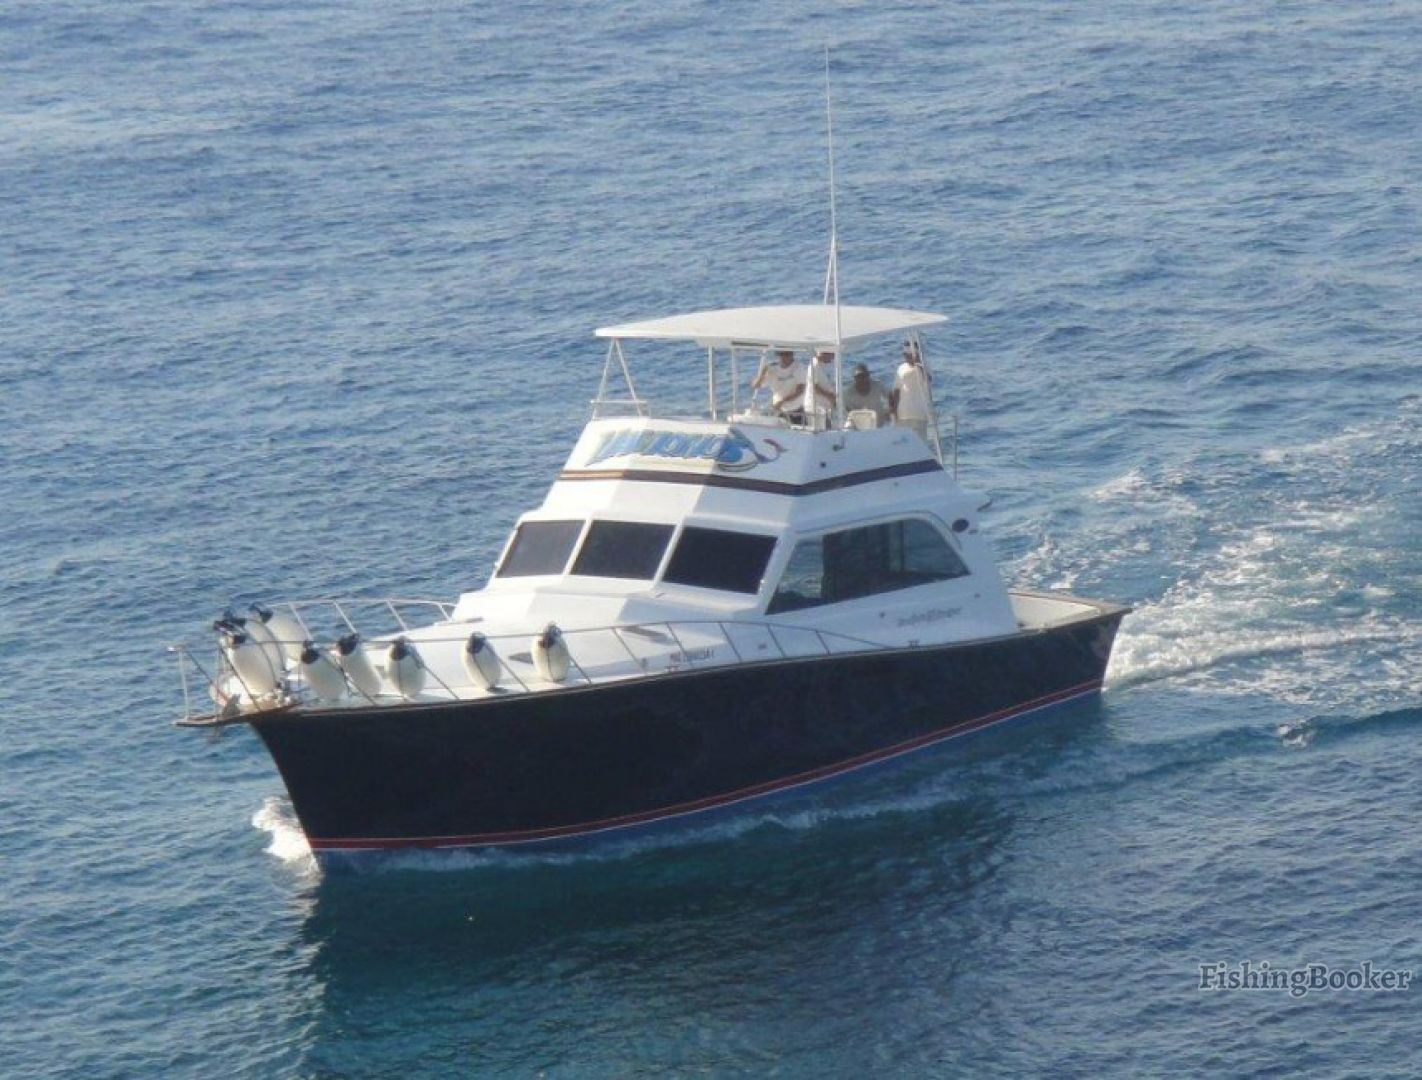 Vamonos sportfishing cozumel mexico for Cozumel fishing charters